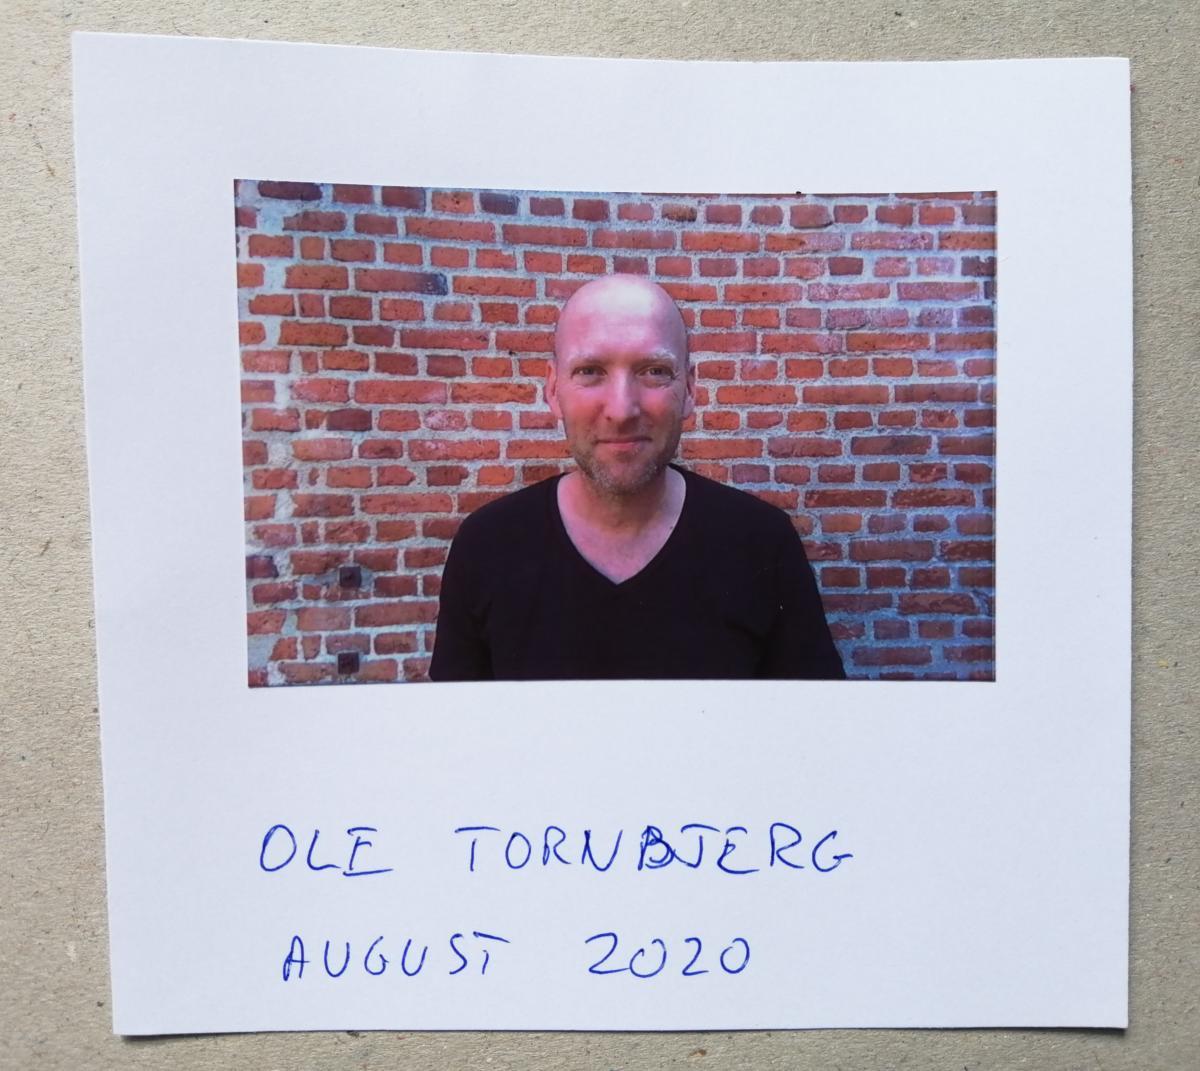 08-20 Ole Tornbjerg